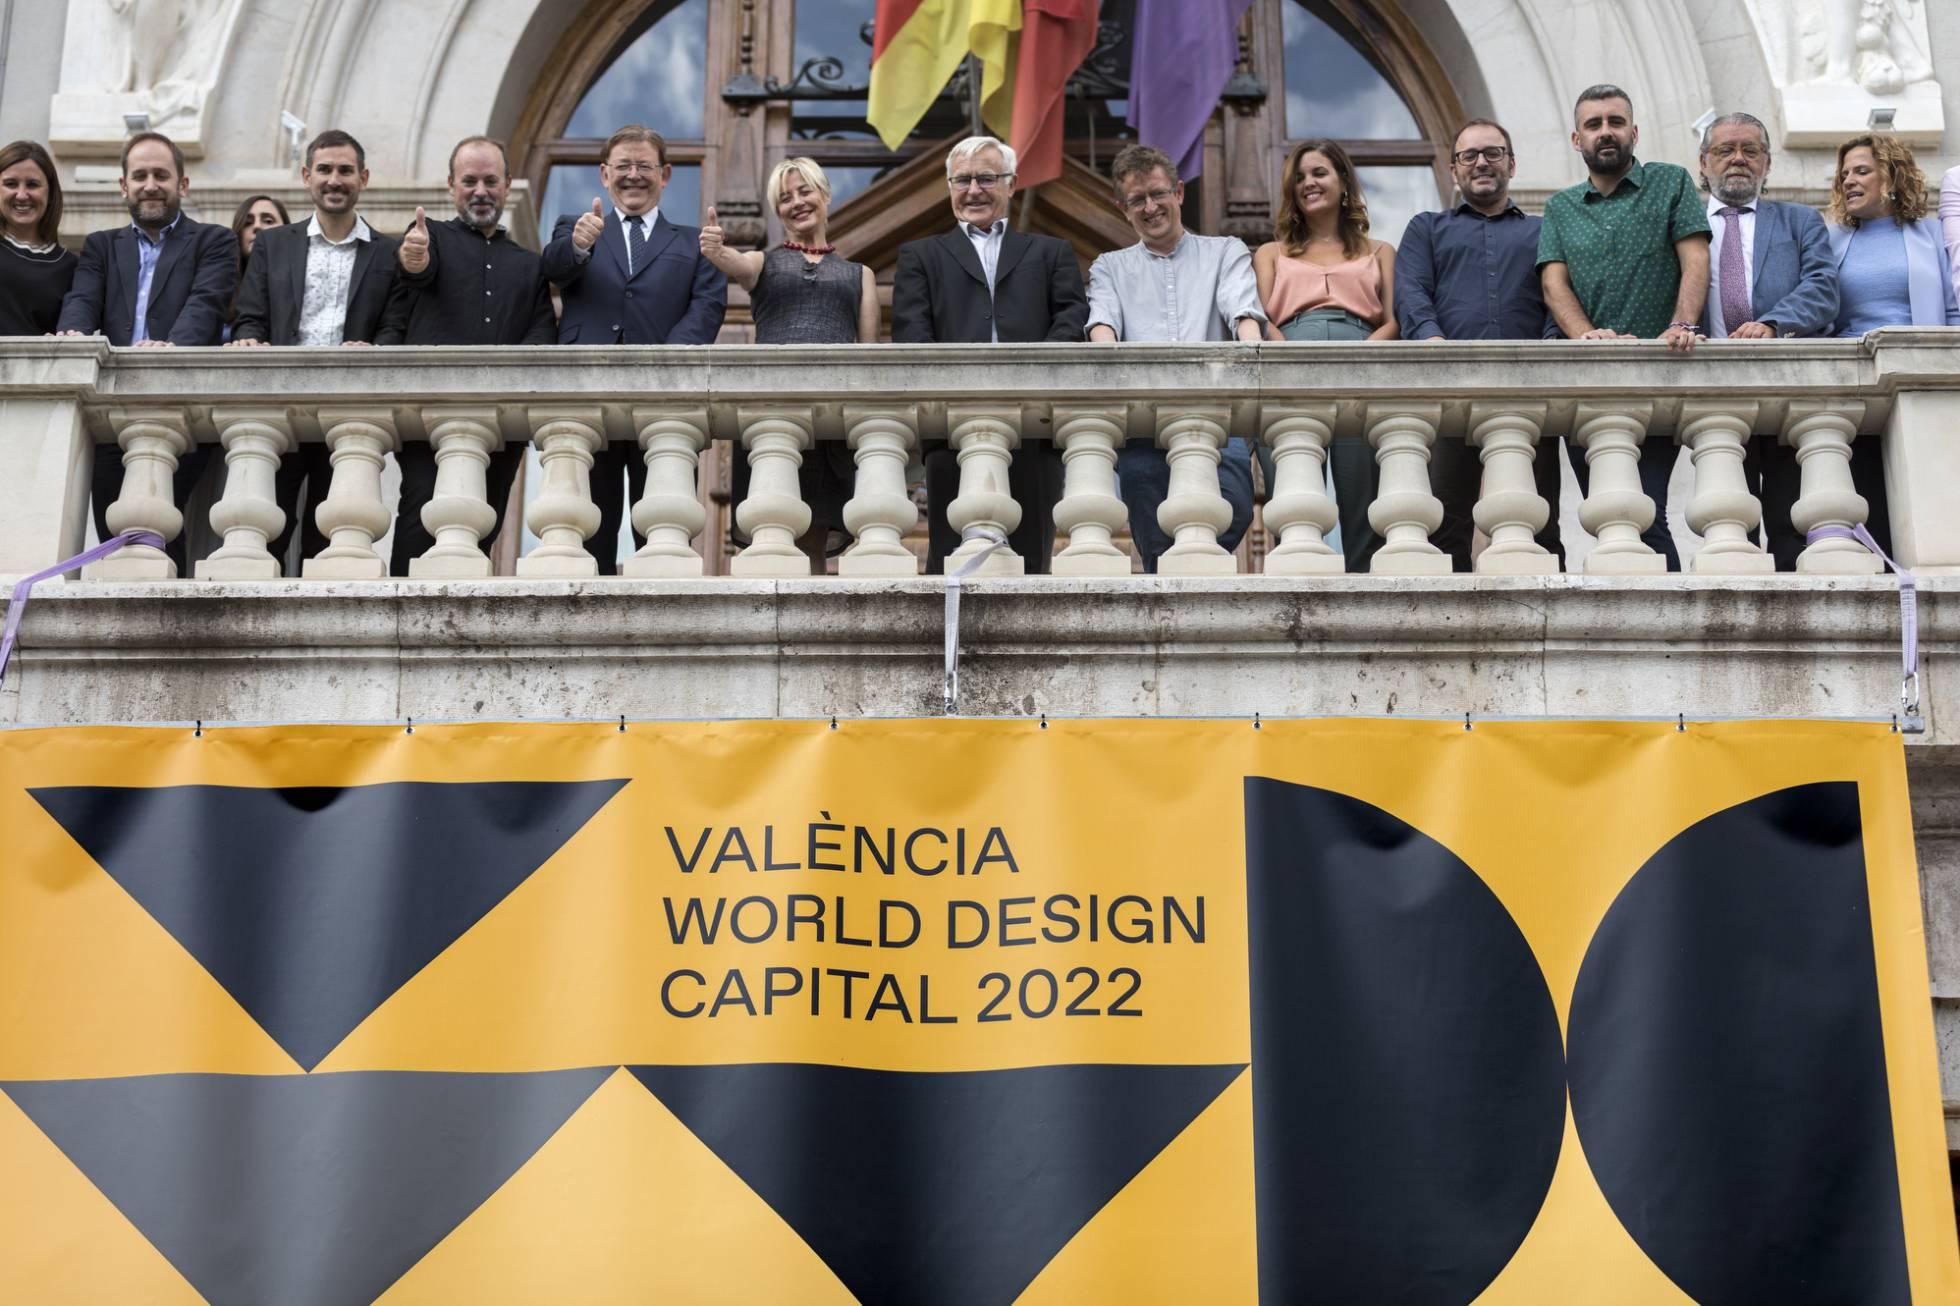 valencia-aspira-a-atraer-a-decenas-de-miles-de-profesionales-al-ser-capital-mundial-del-diseño